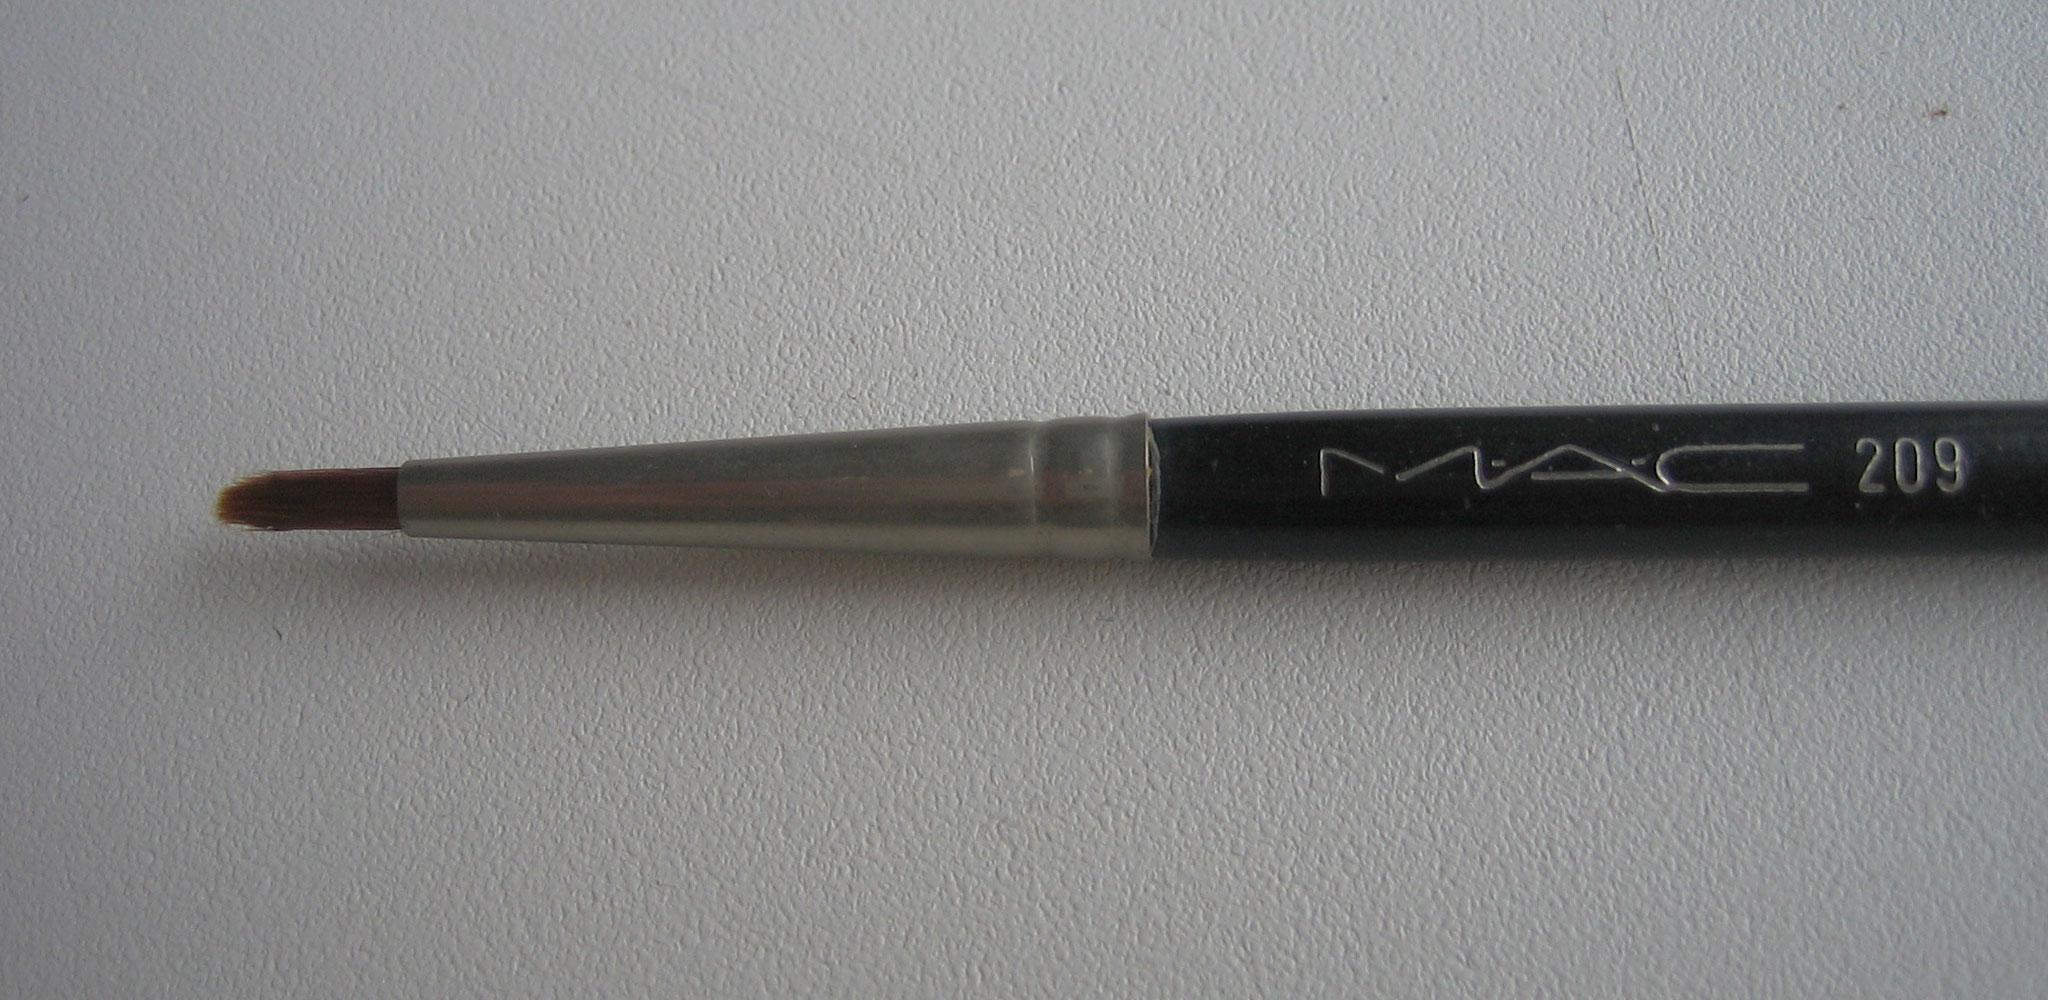 mac209